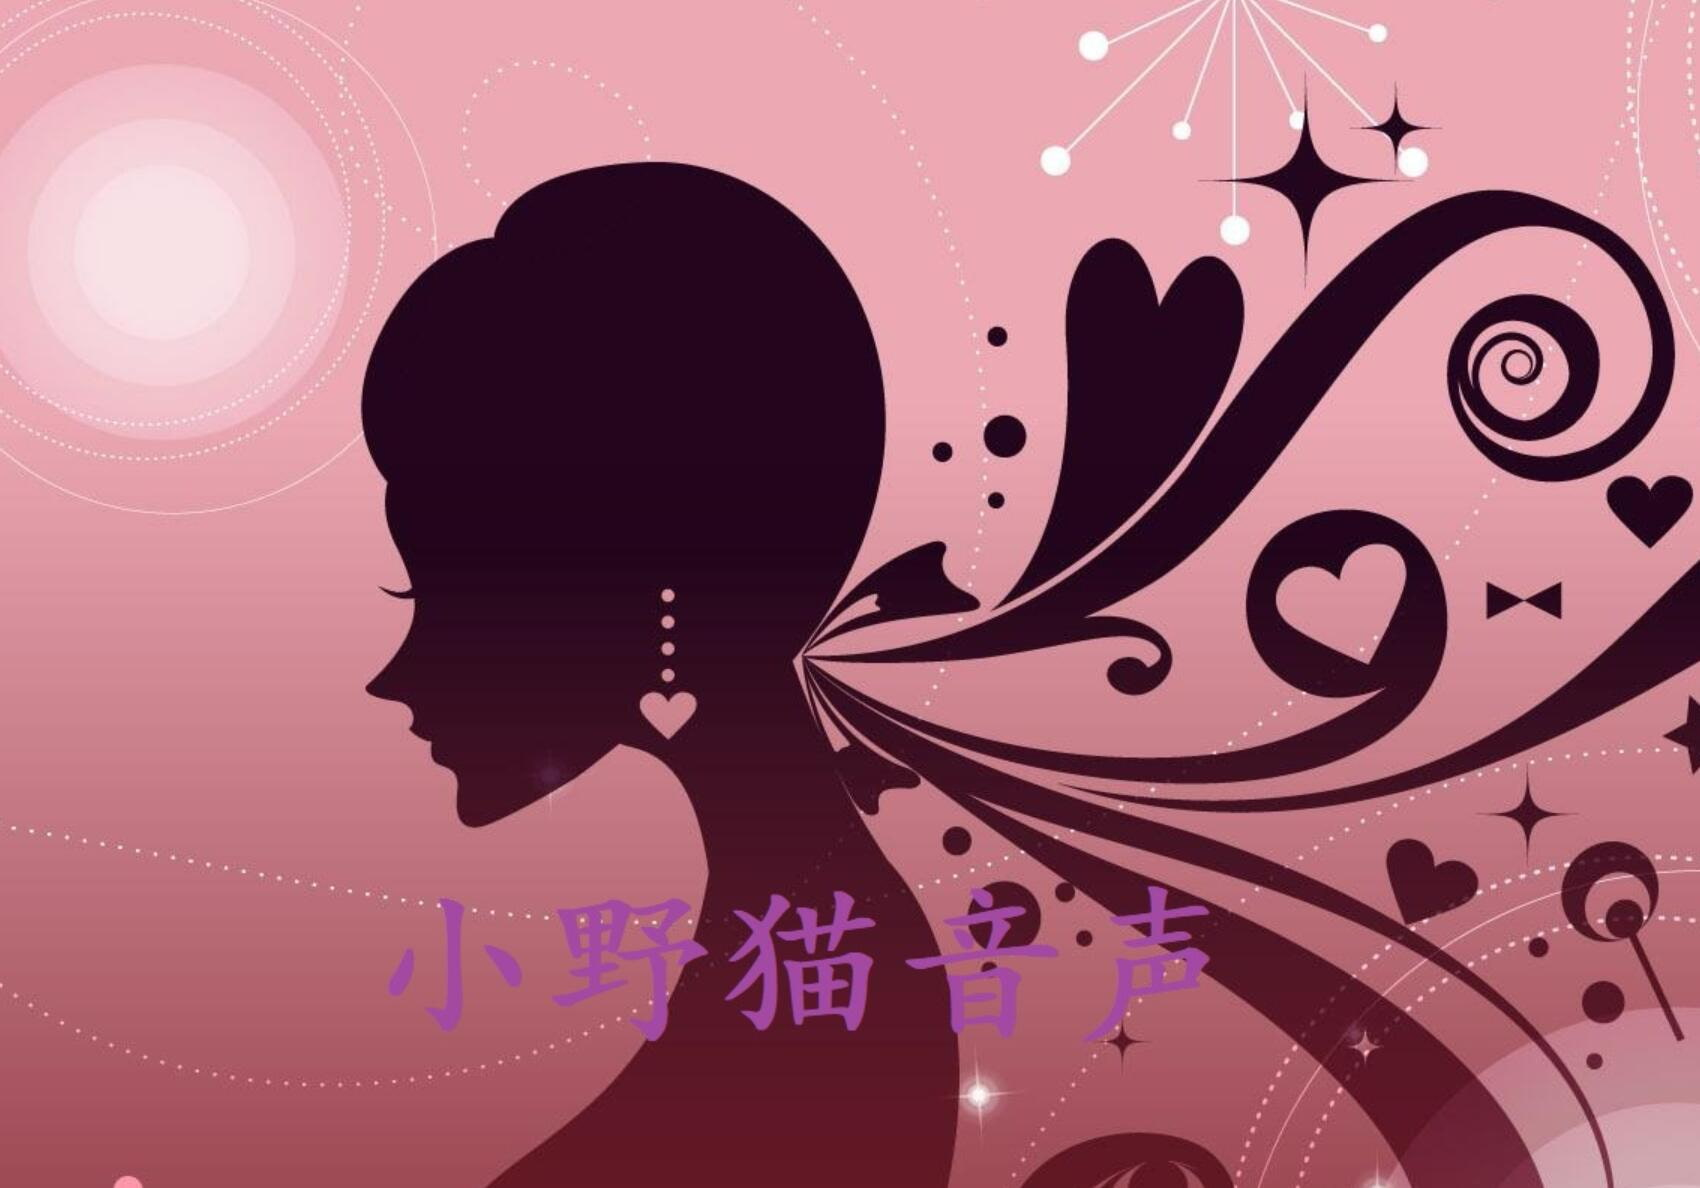 RJ320091 小野猫音声 铃铛女妖1 CV小野猫 早期作品 [20210308]